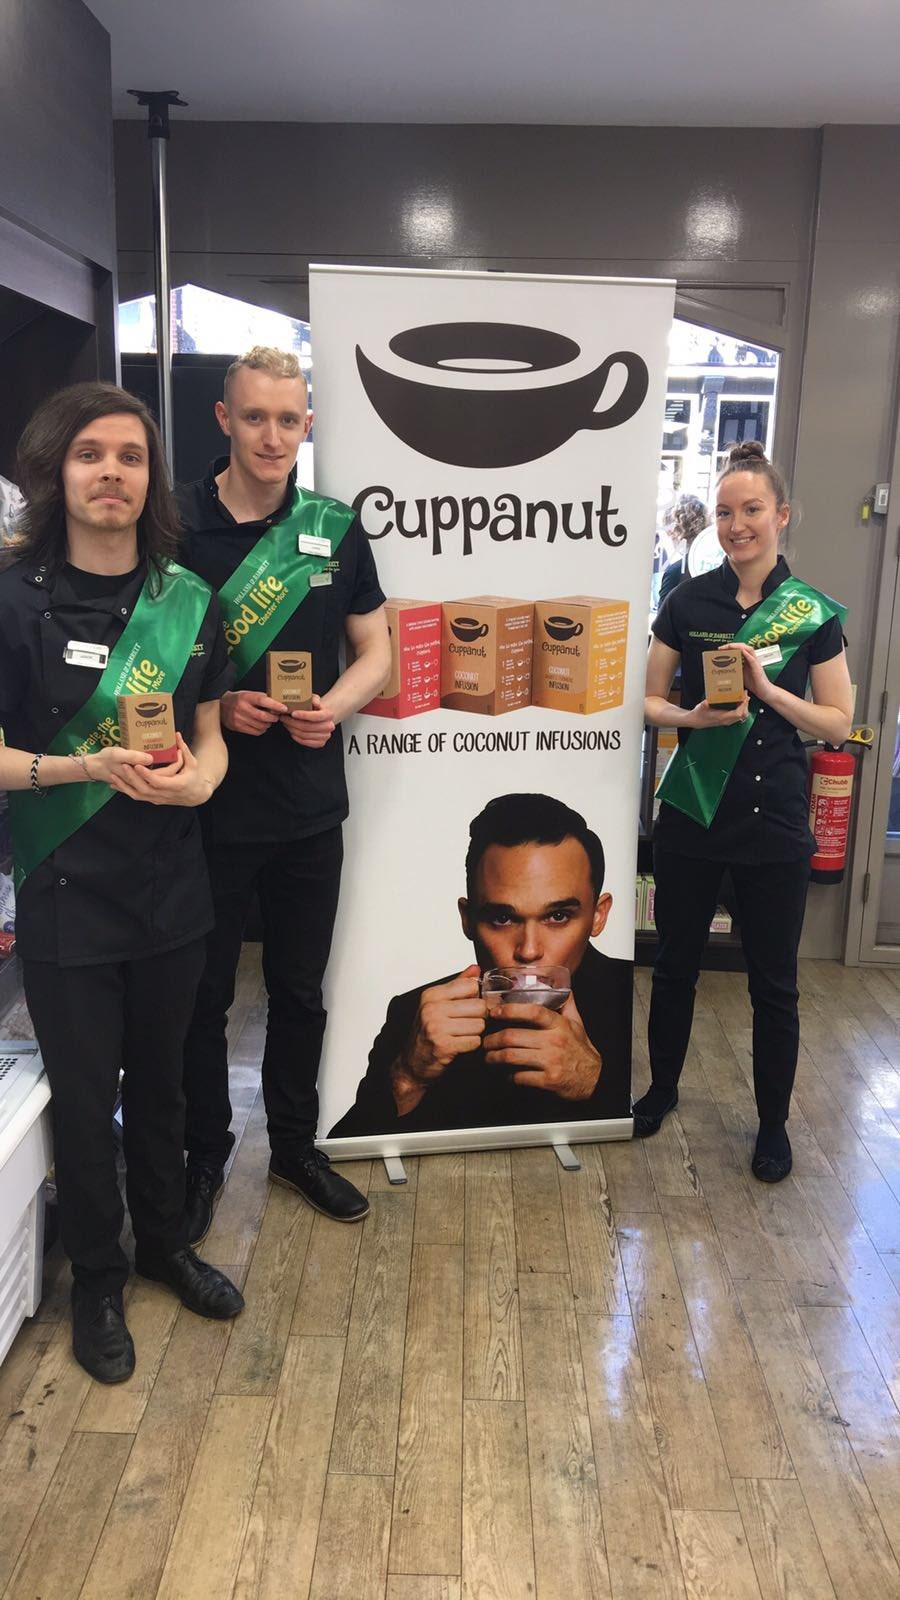 The @holland_barrett team in Chester seem to LOVE @cuppanuttea https://t.co/6VKYq7DNY8